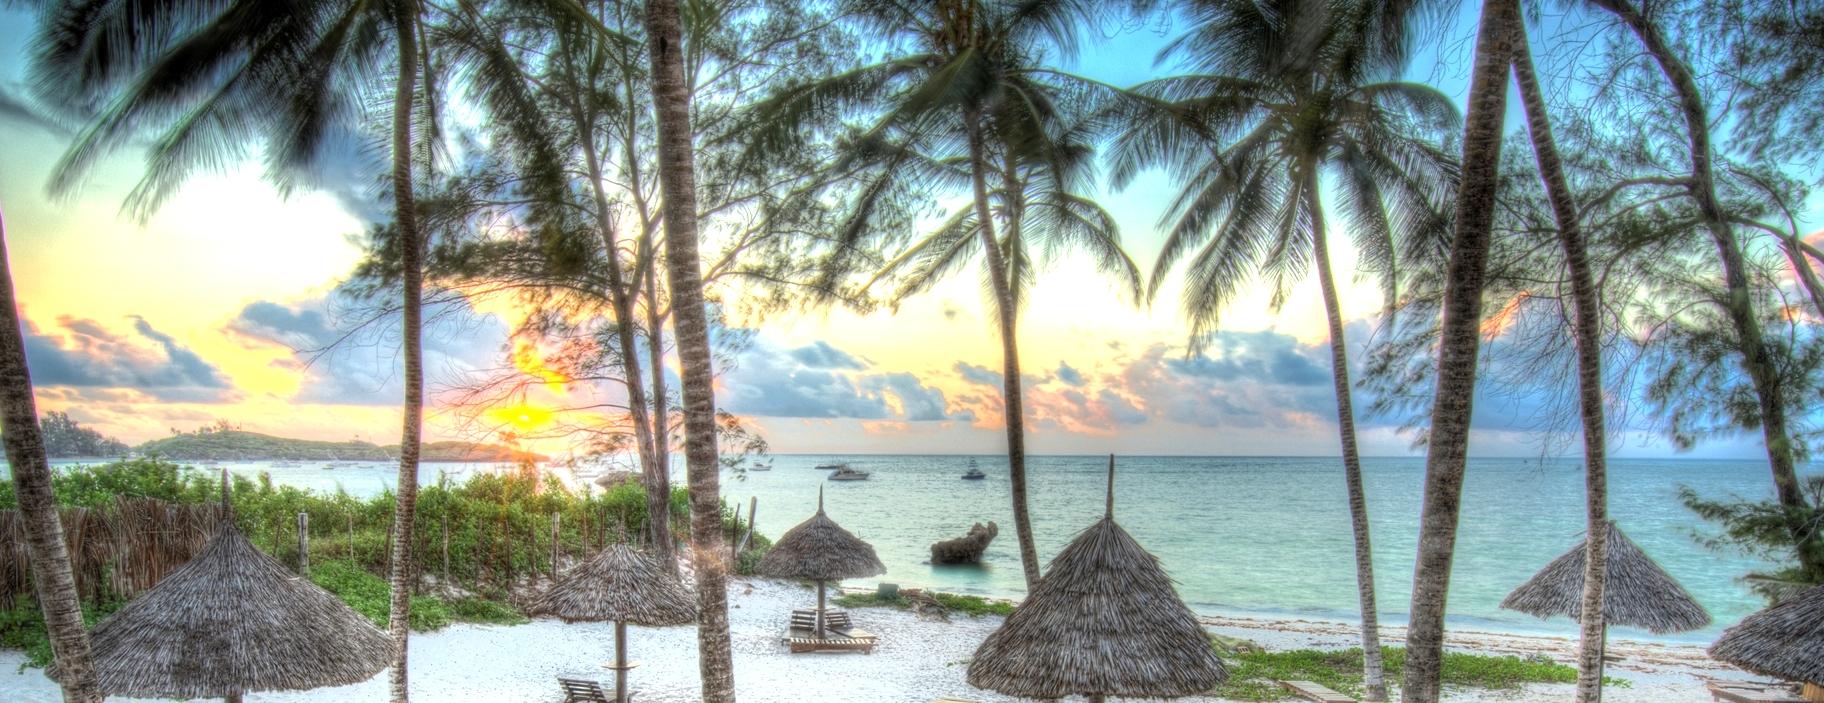 Turtle Bay Beach Club Where To Stay Wonders Of Watamu